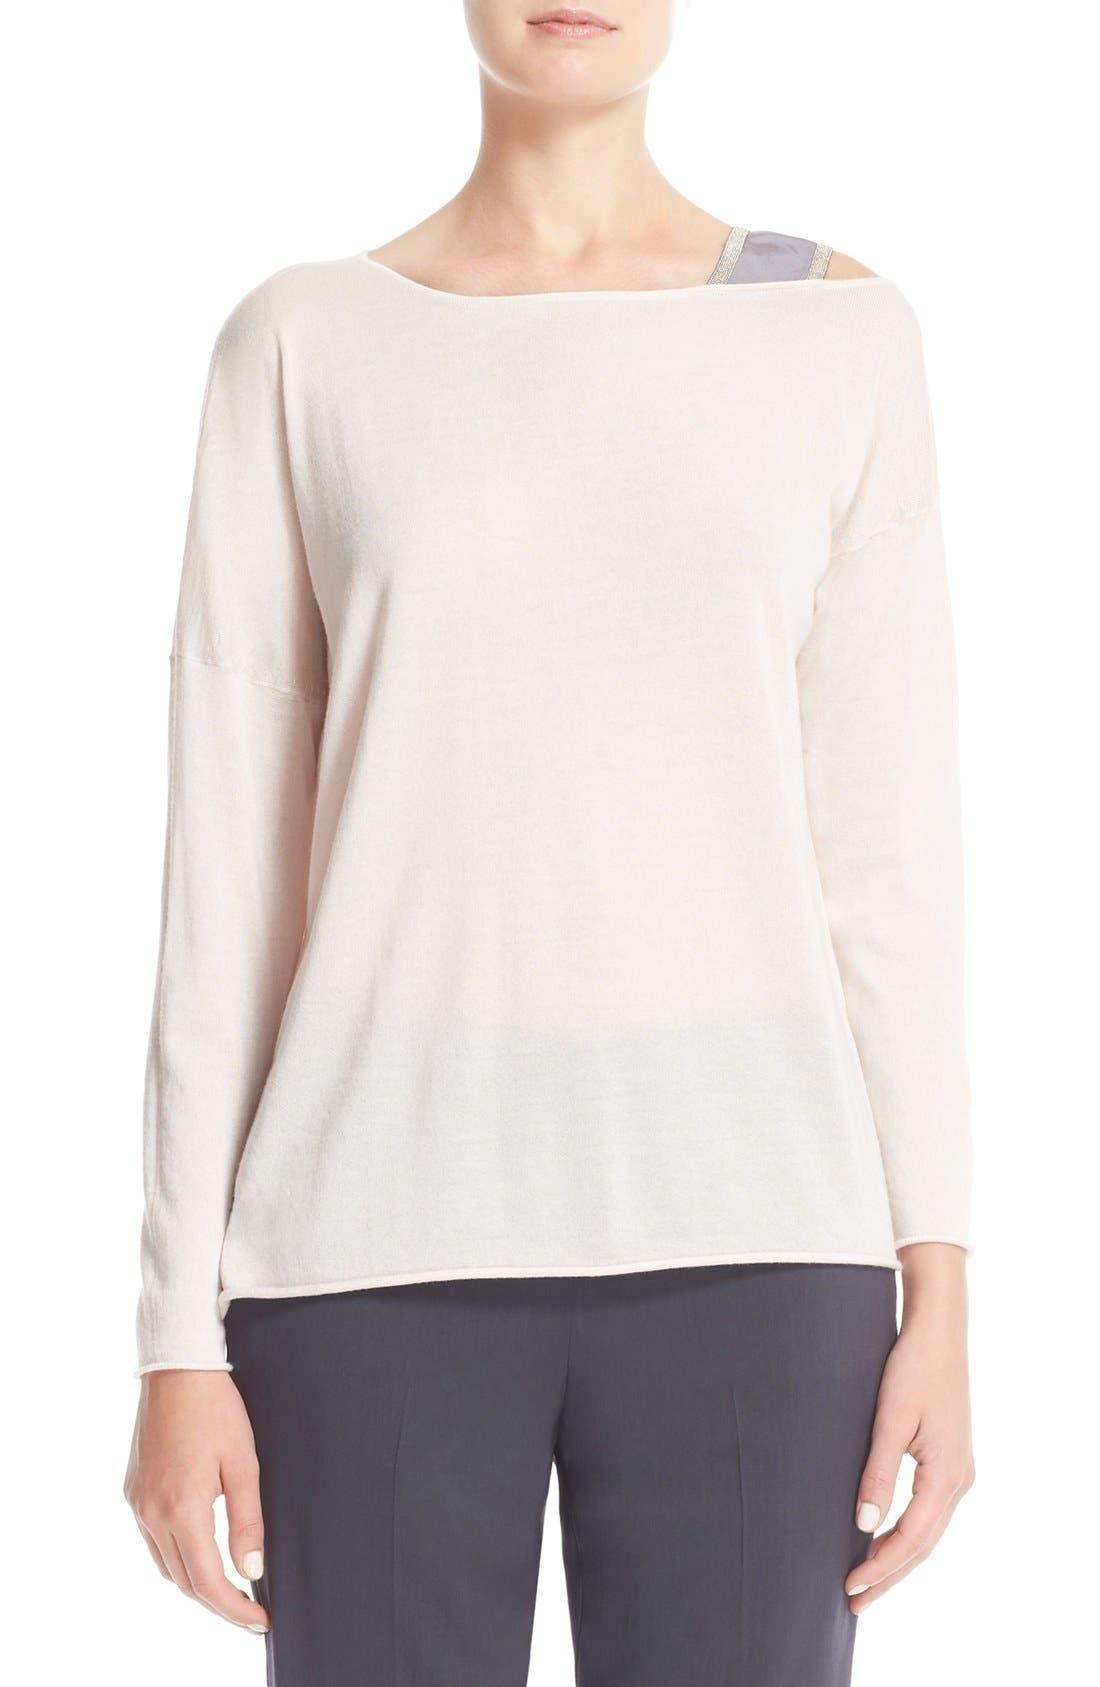 FABIANA FILIPPI Beaded Cashmere & Silk Sweater